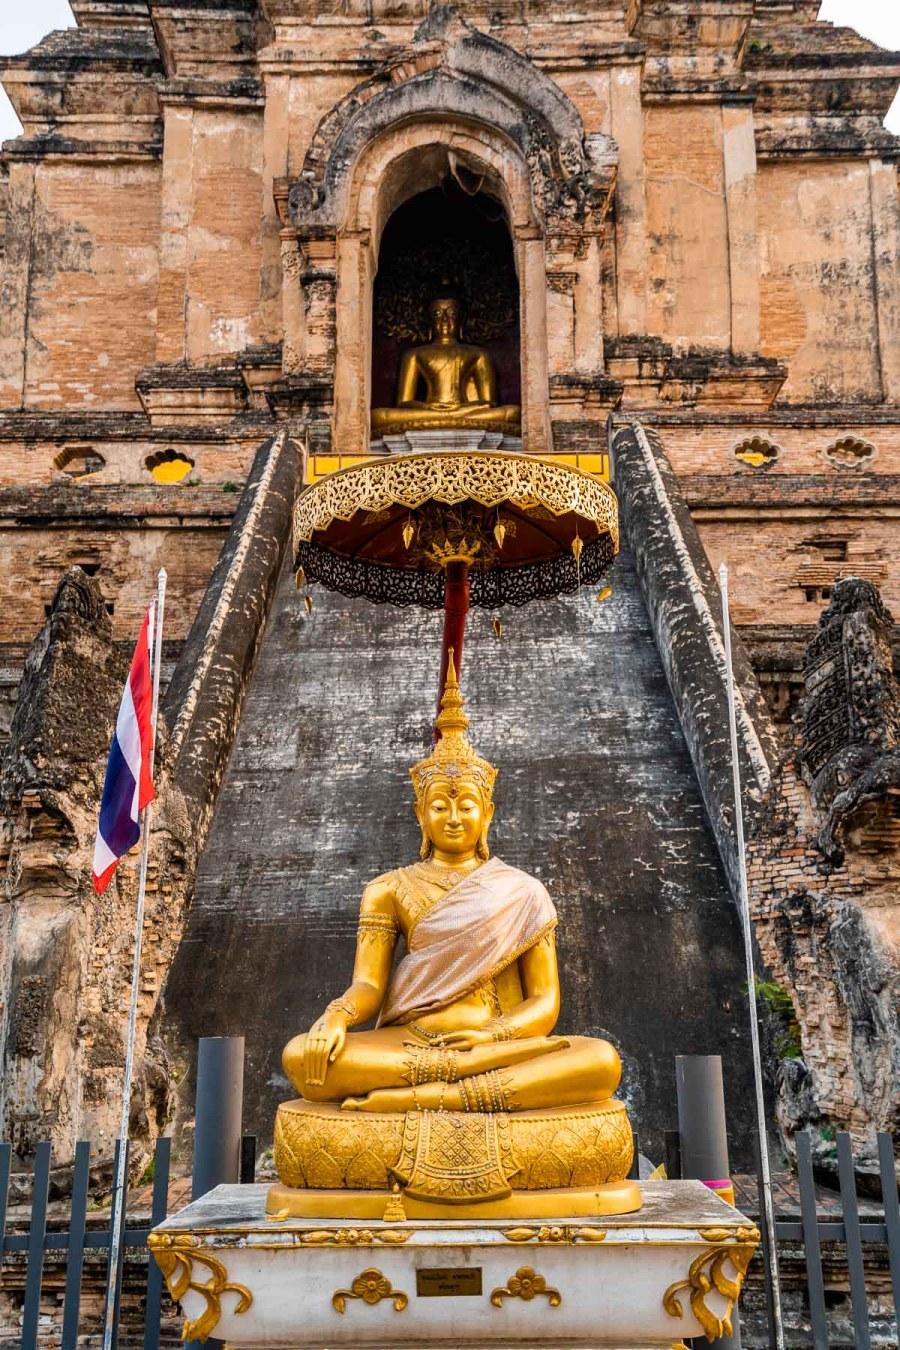 Golden Buddha at Wat Chedi Luang Temple in Chiang Mai